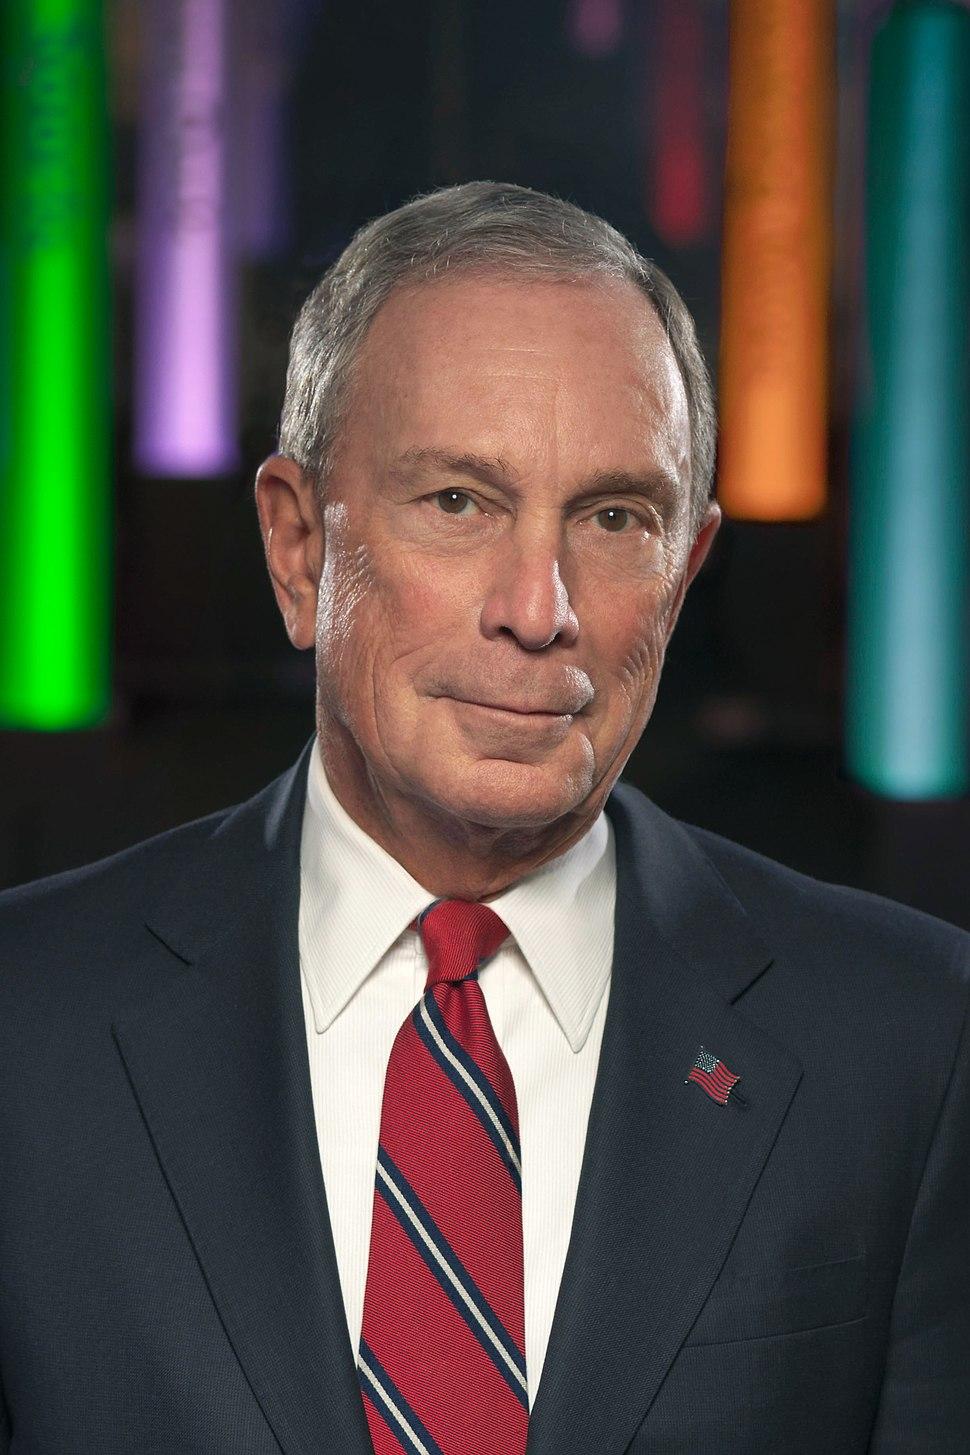 Mike Bloomberg Headshot.jpg